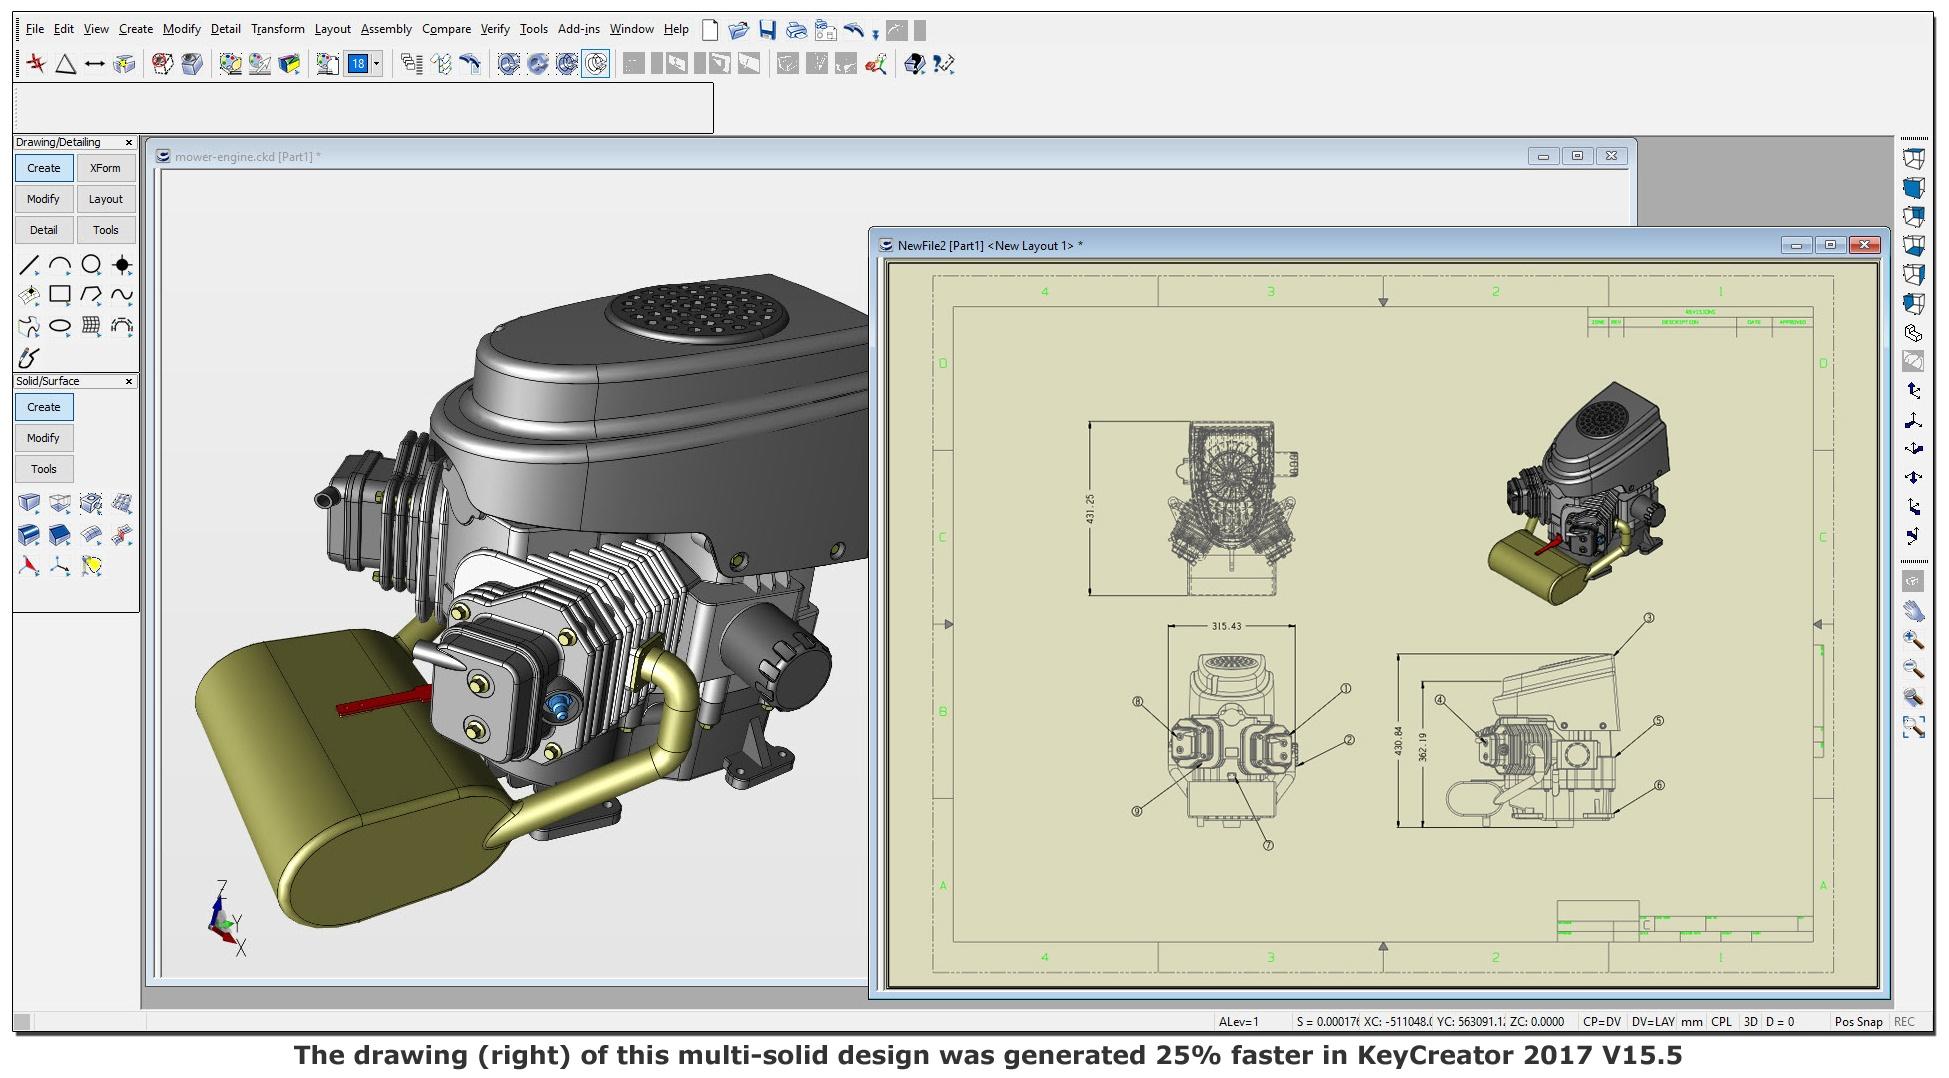 Kubotek3D Announces Latest Release of Kubotek CAD/CAM Products